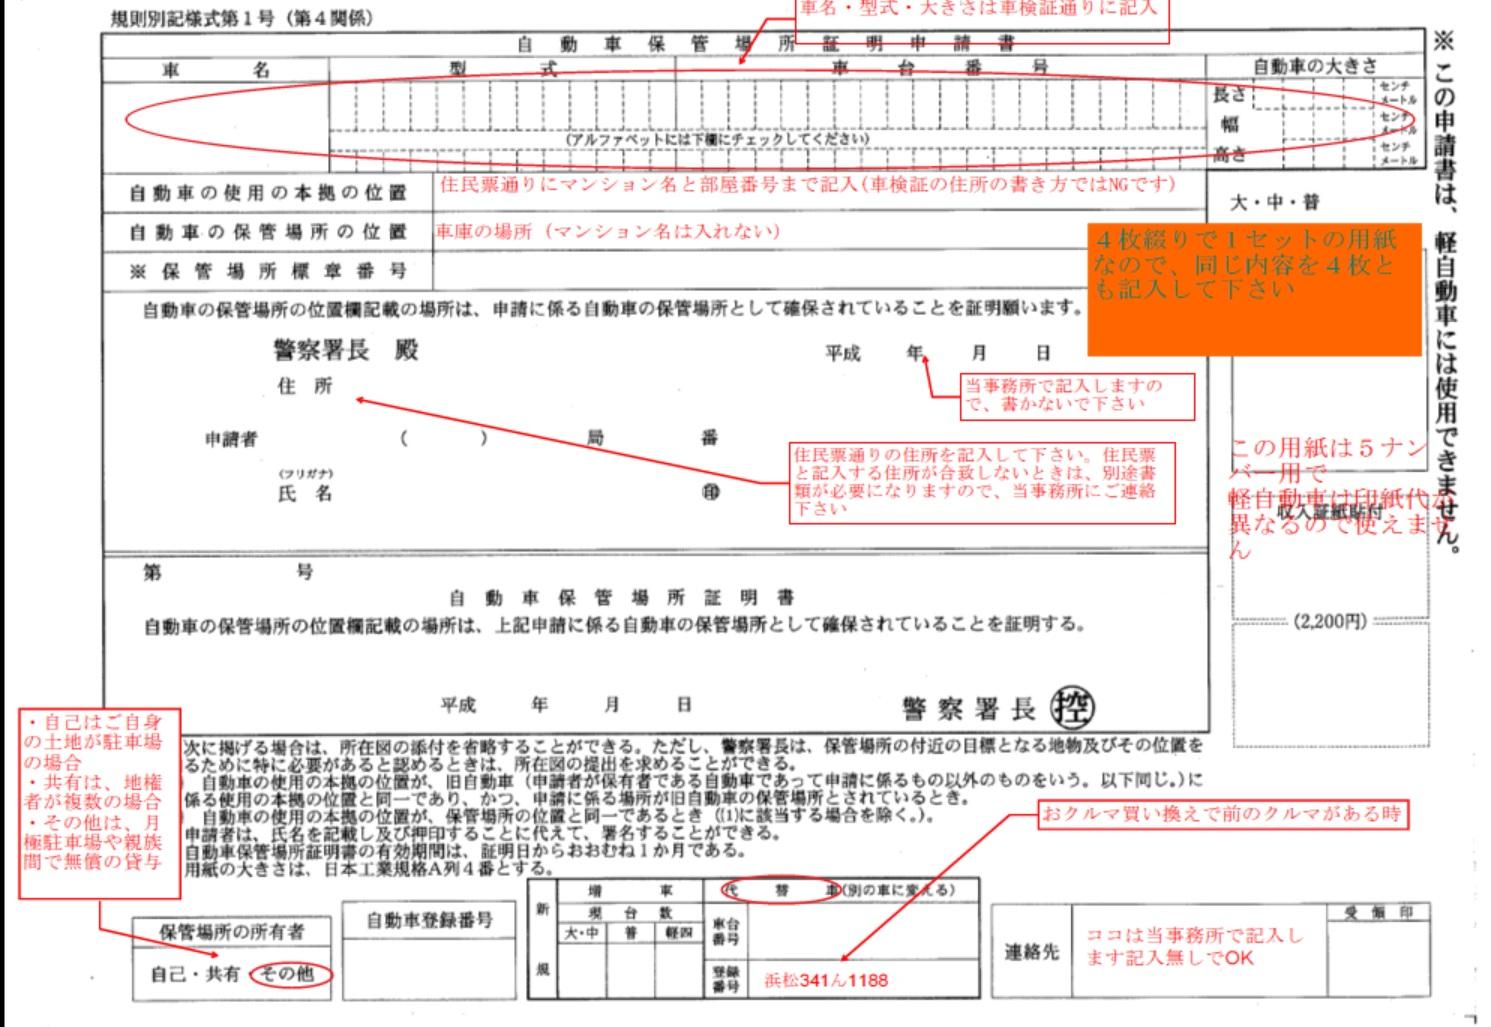 印鑑登録・印鑑証明 東京都府中市ホームページ